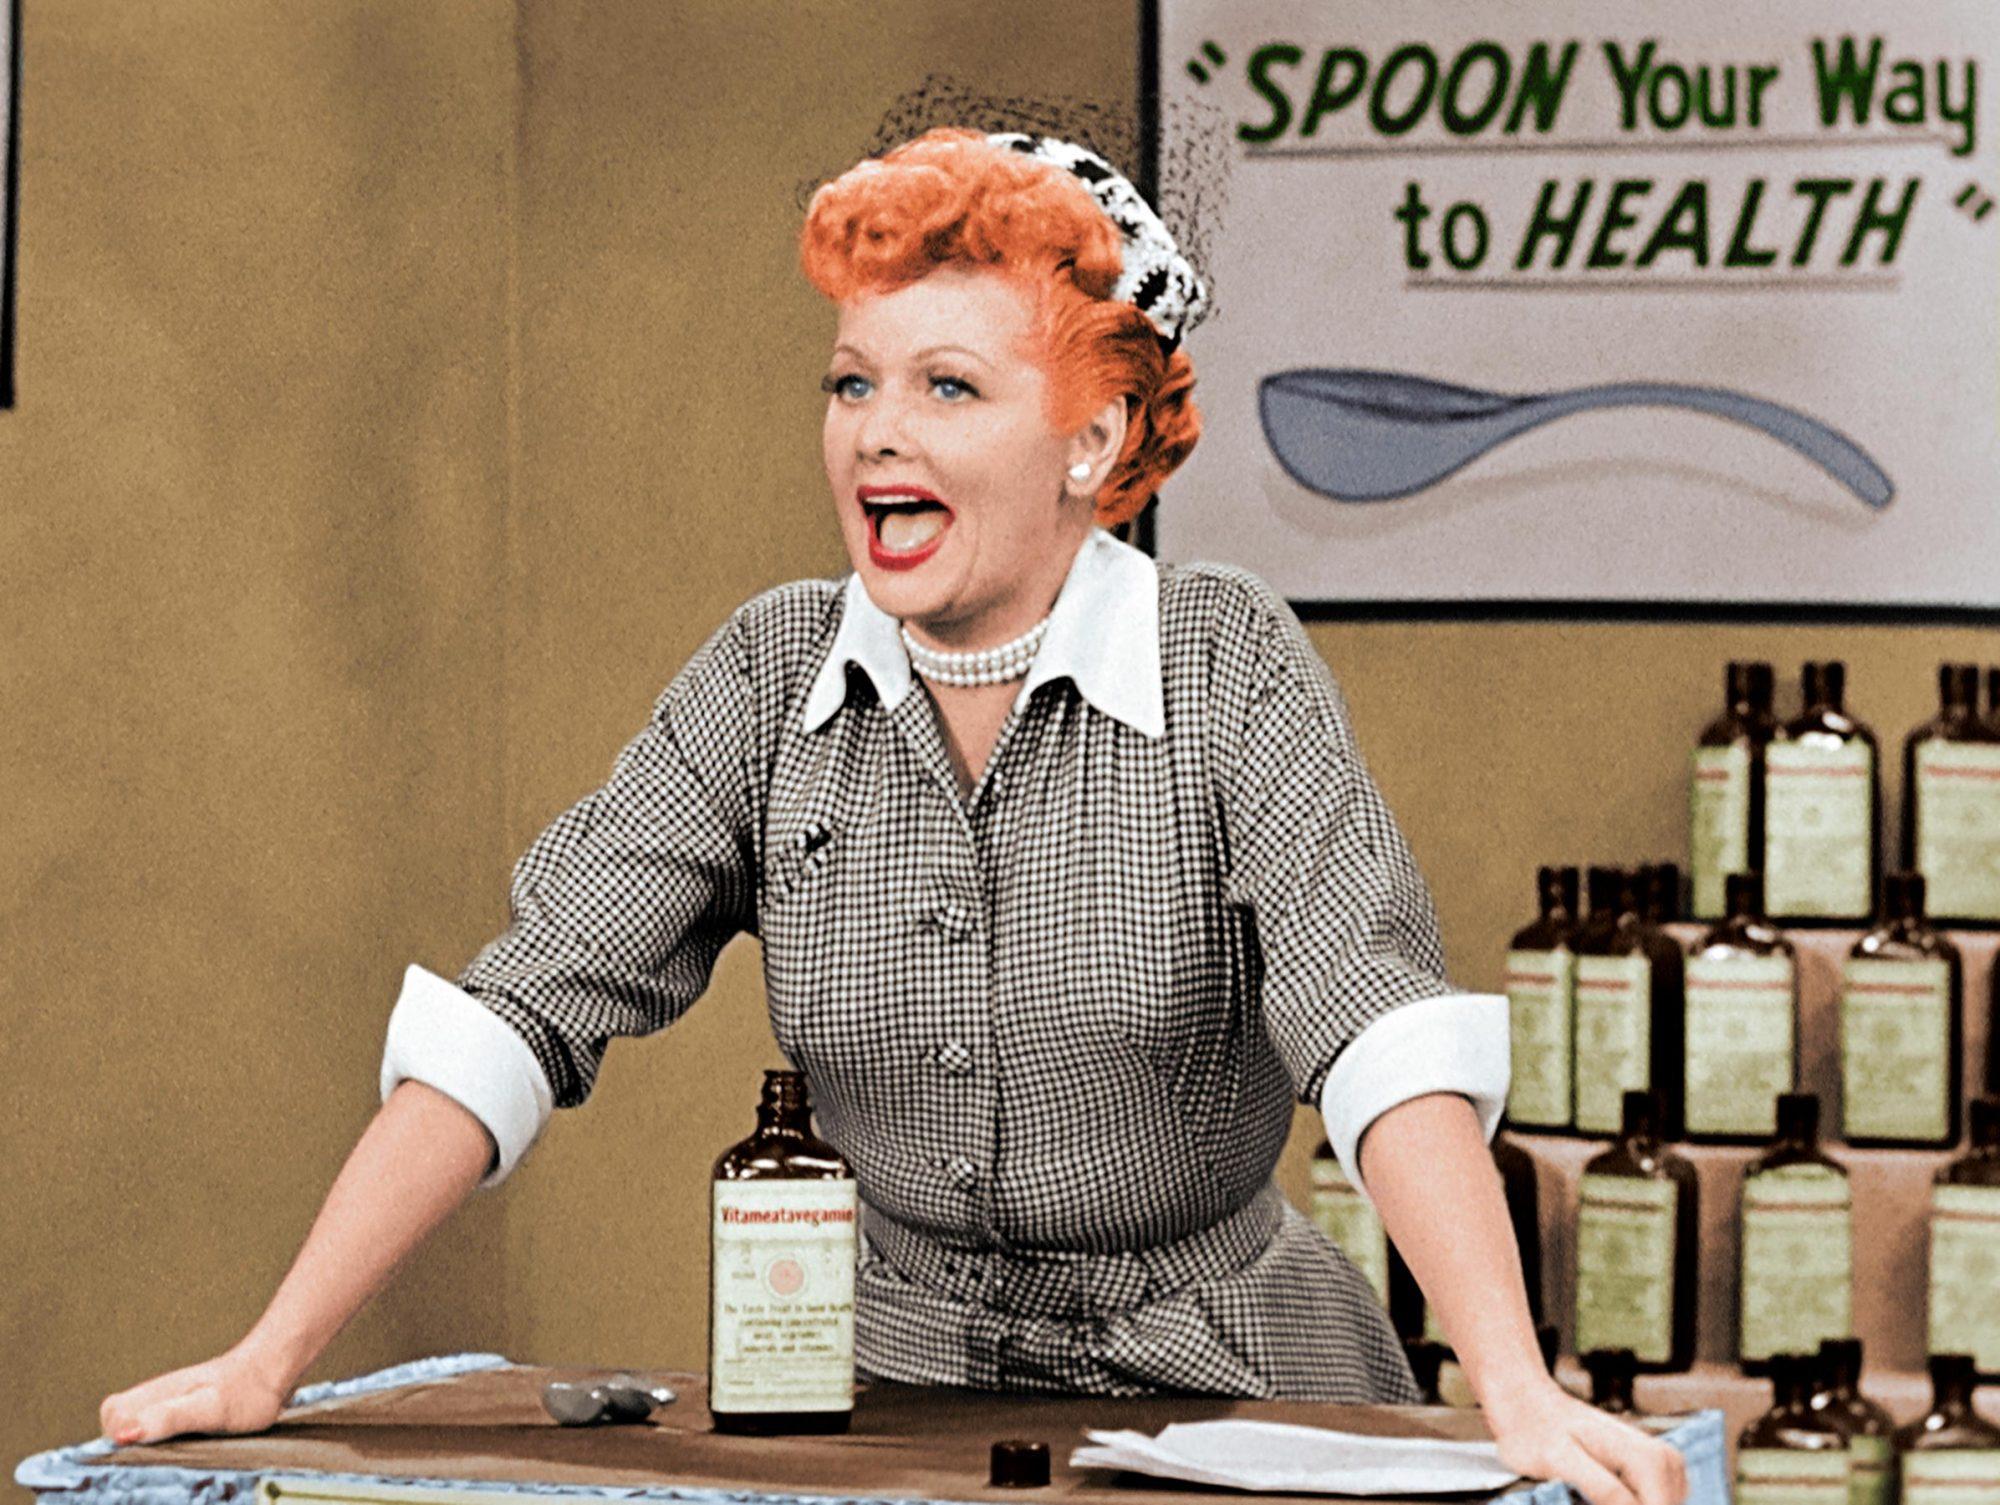 I Love Lucy 'Vitameatavegamin' episode CR: Fathom Events/CBS Home Entertainment